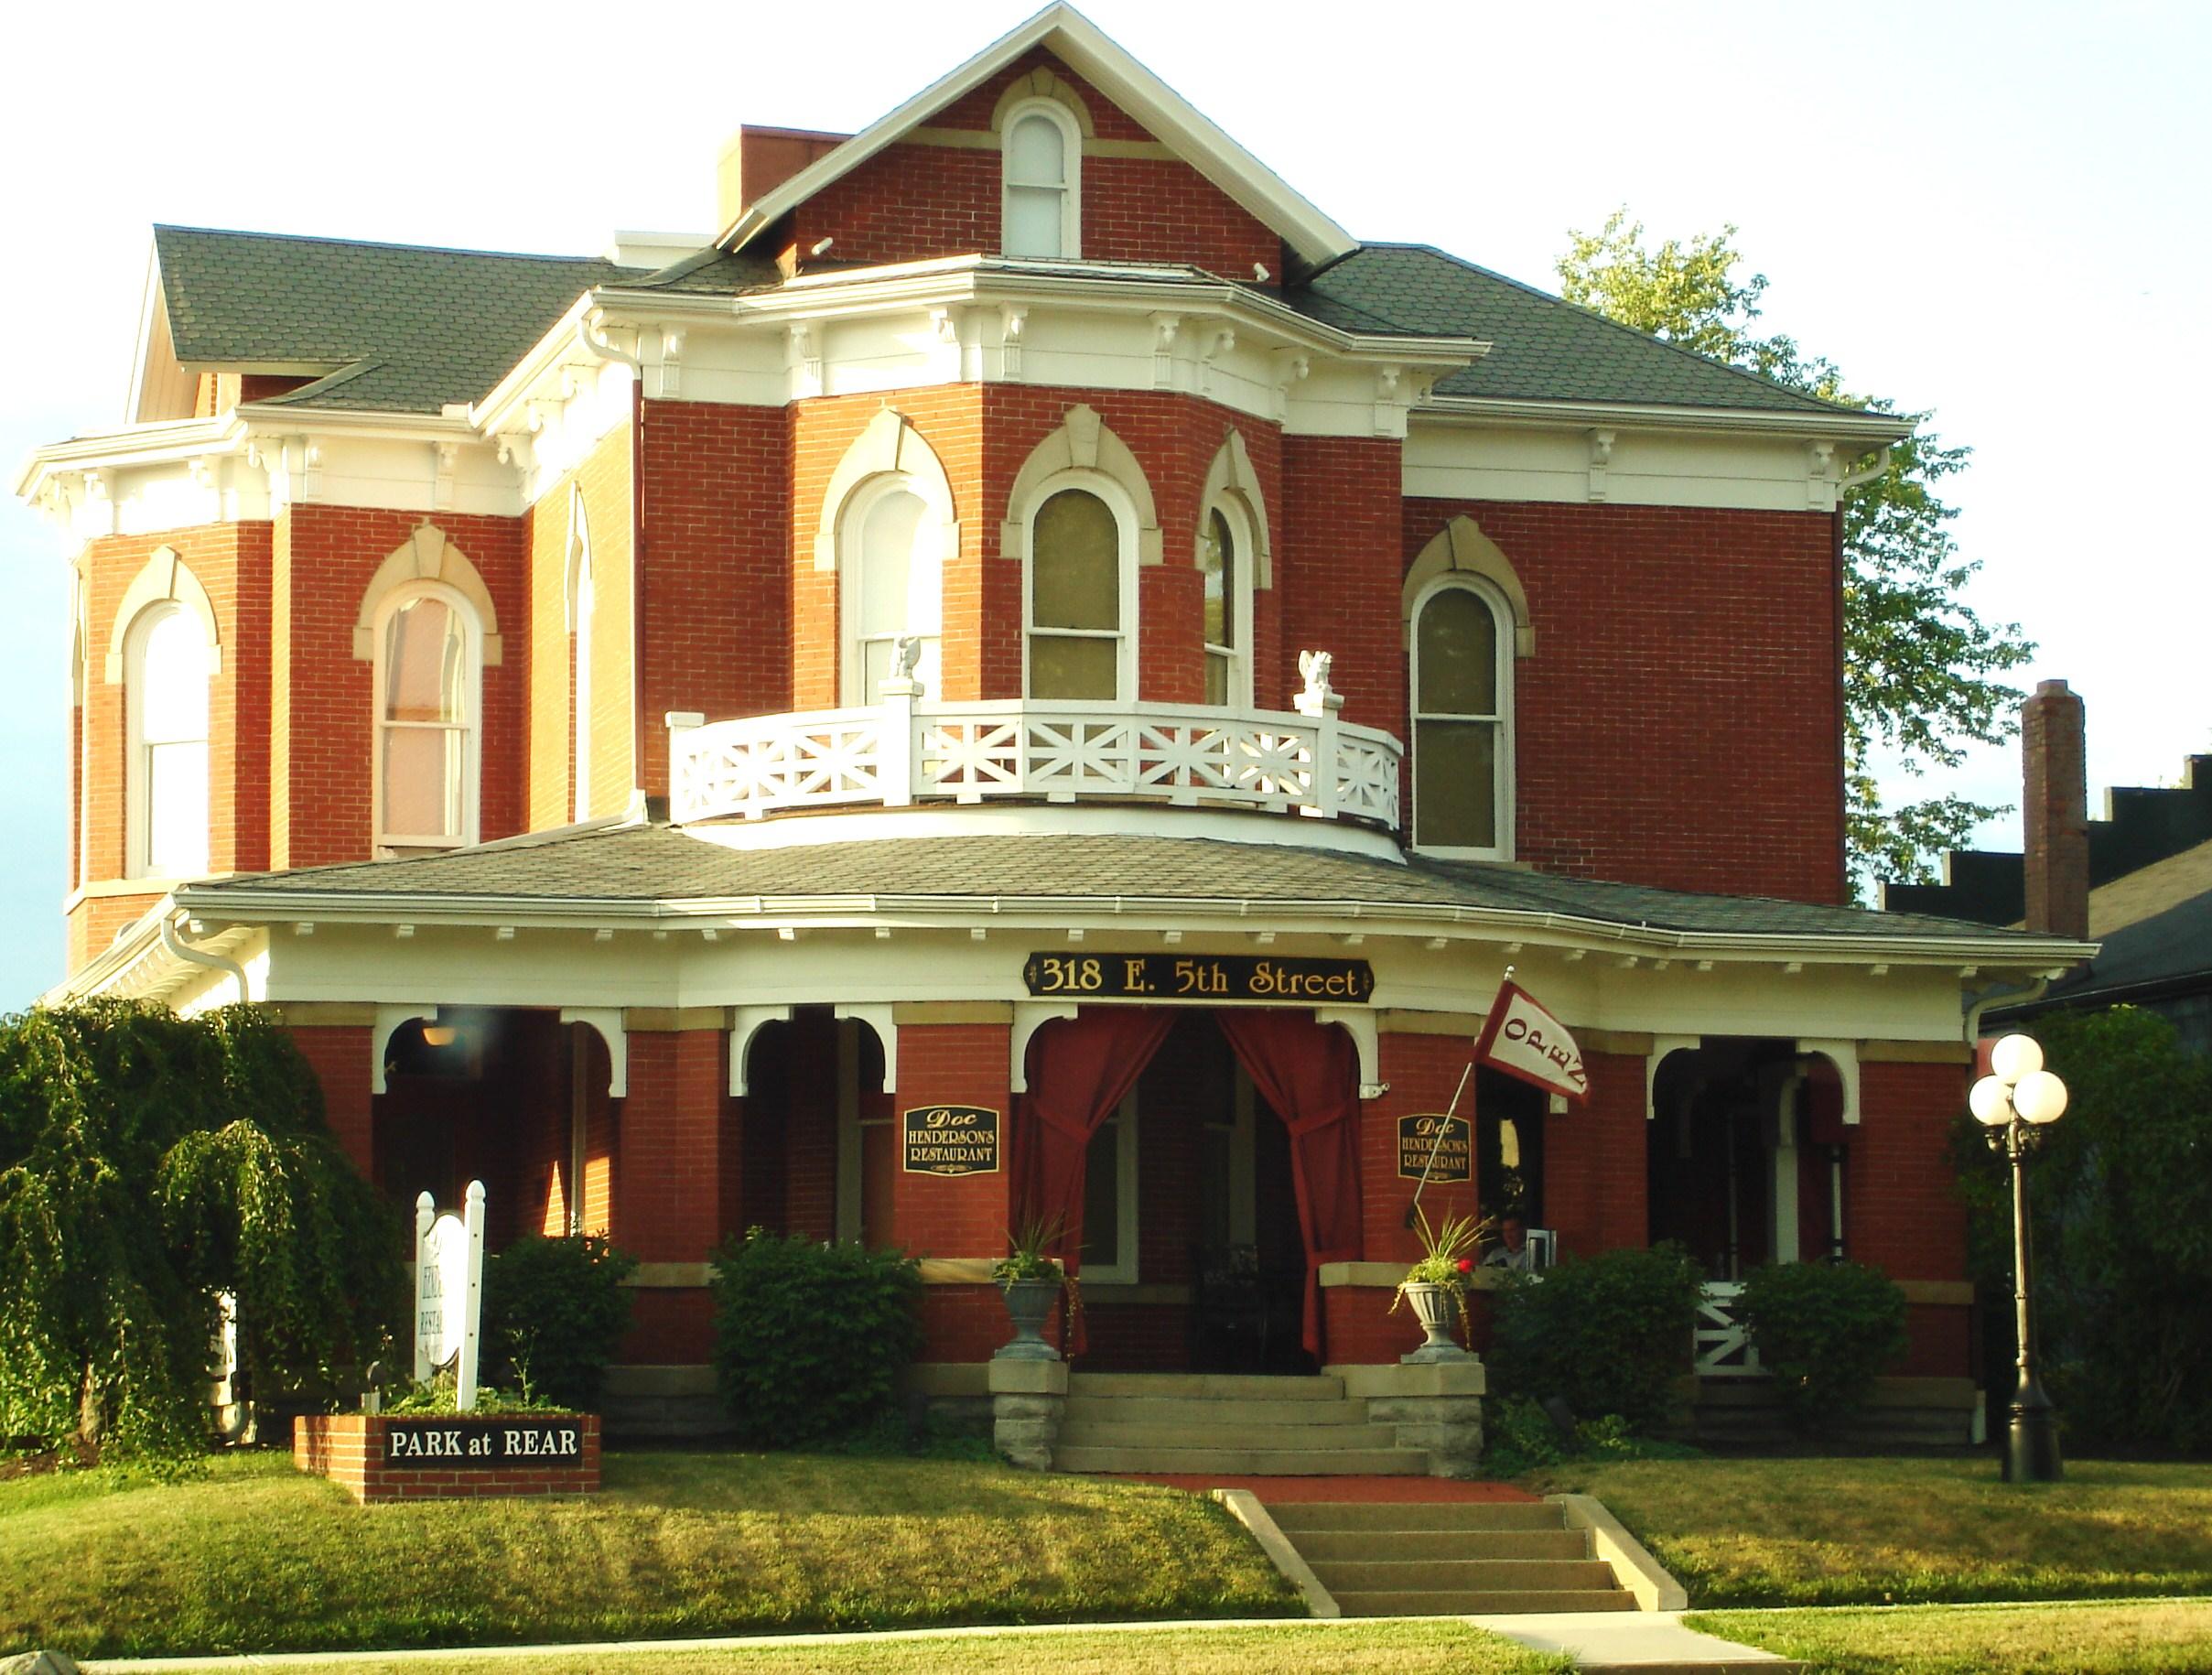 Union county ohio familypedia fandom powered by wikia for Building a home in ohio